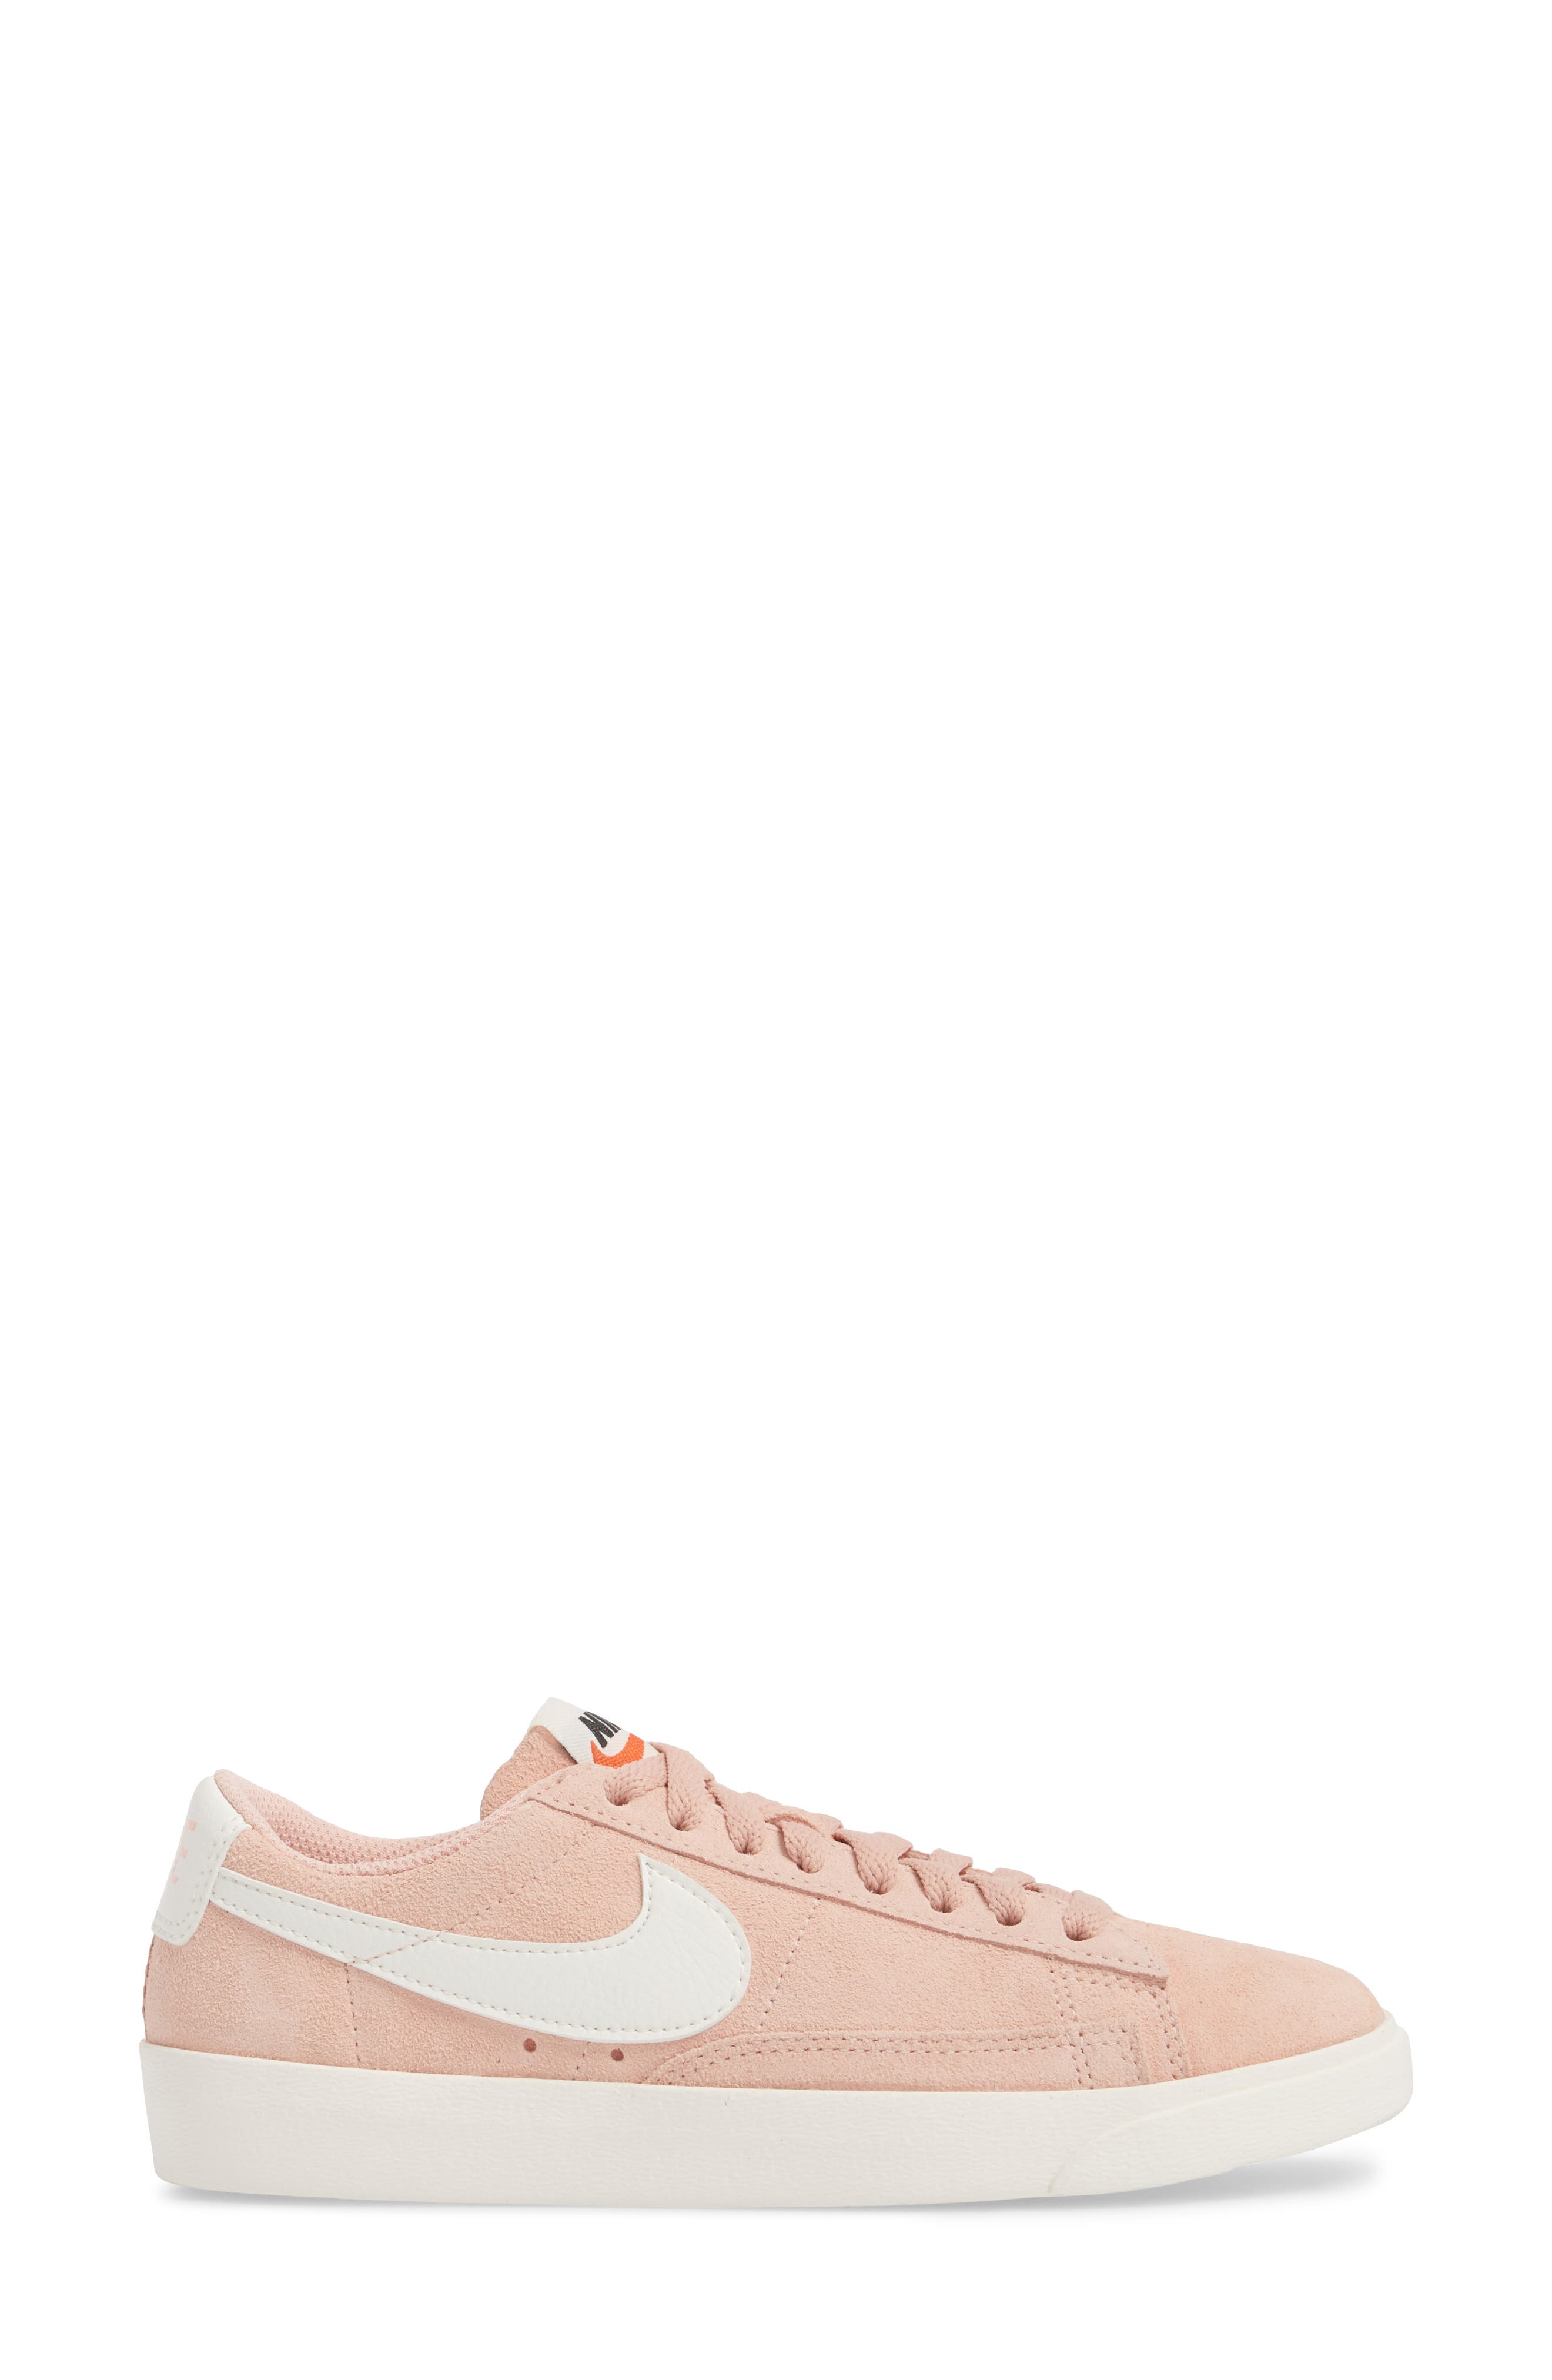 Blazer Low Sneaker,                             Alternate thumbnail 15, color,